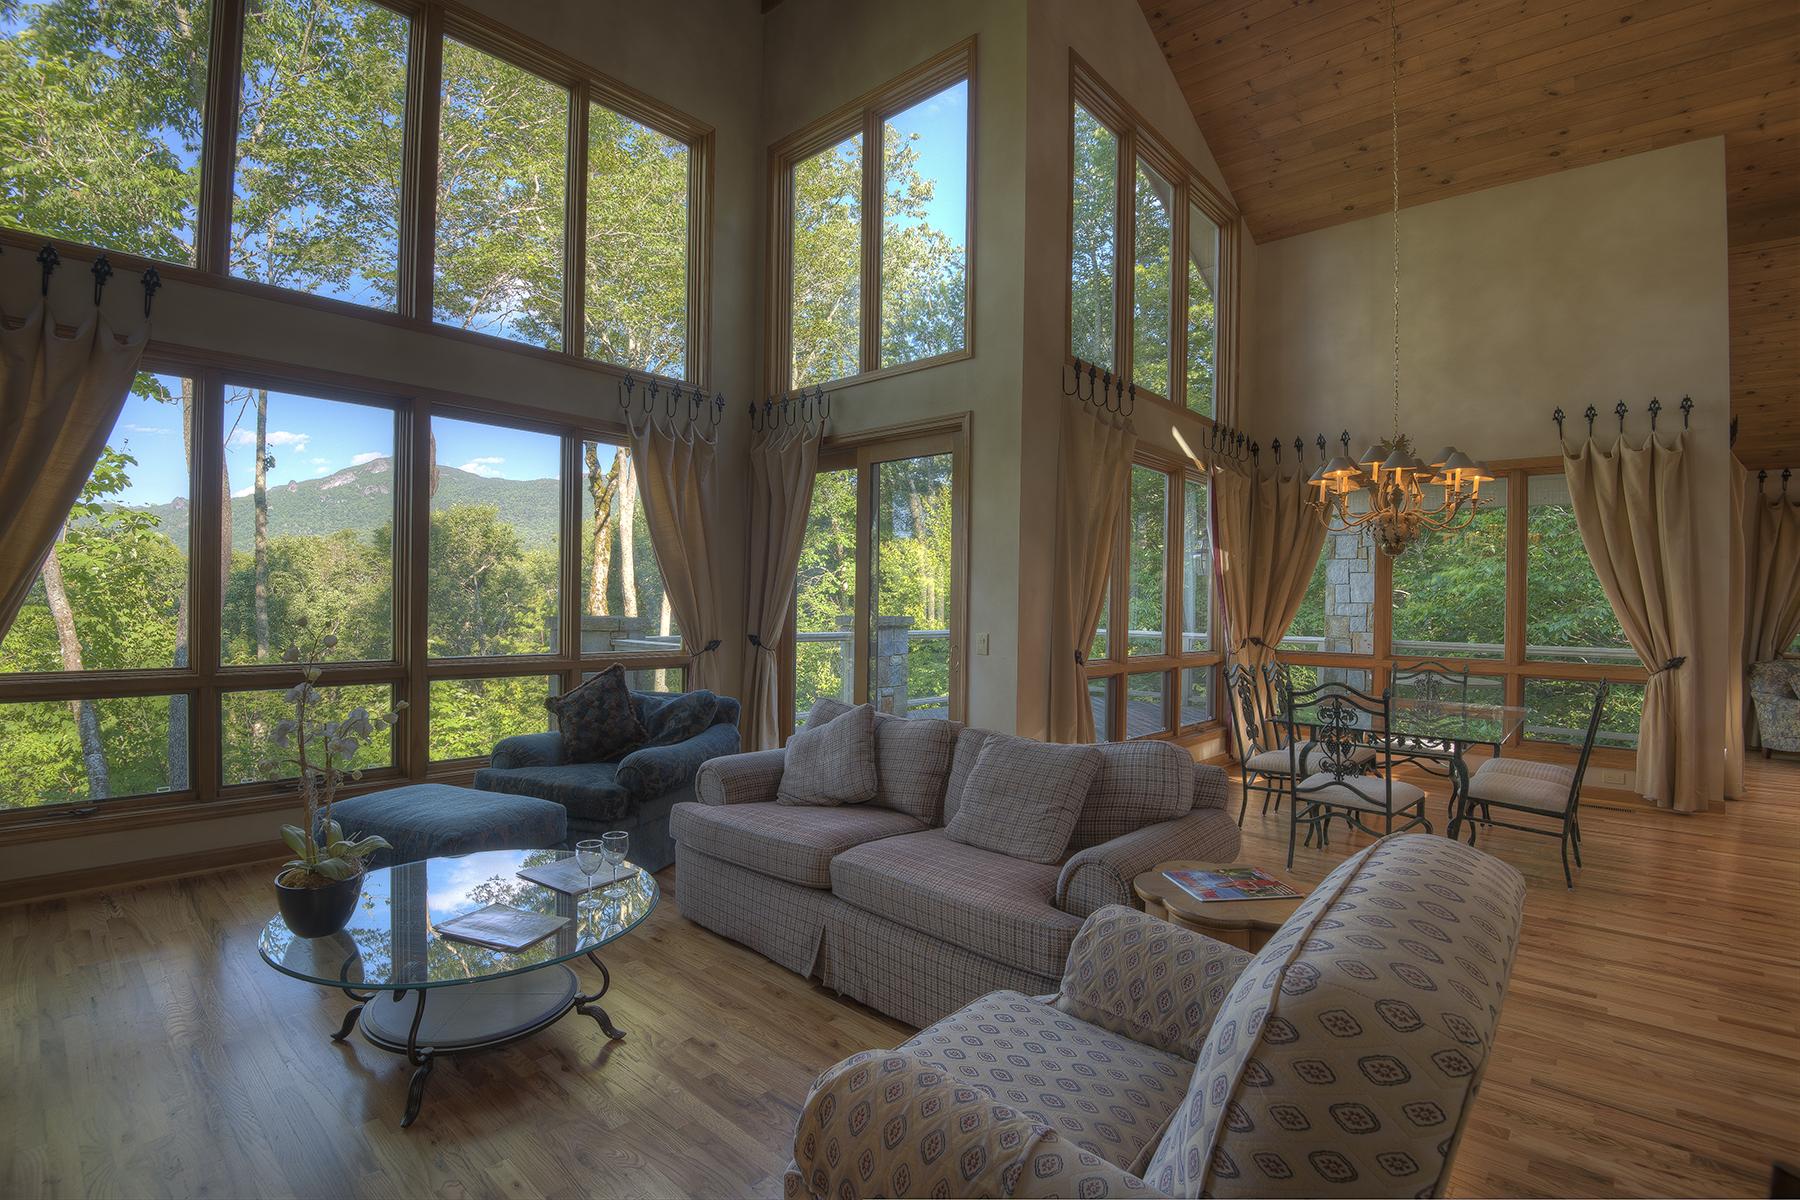 Single Family Home for Sale at LINVILLE - LINVILLE RIDGE 1515 Cranberry 15, Linville, North Carolina 28646 United States